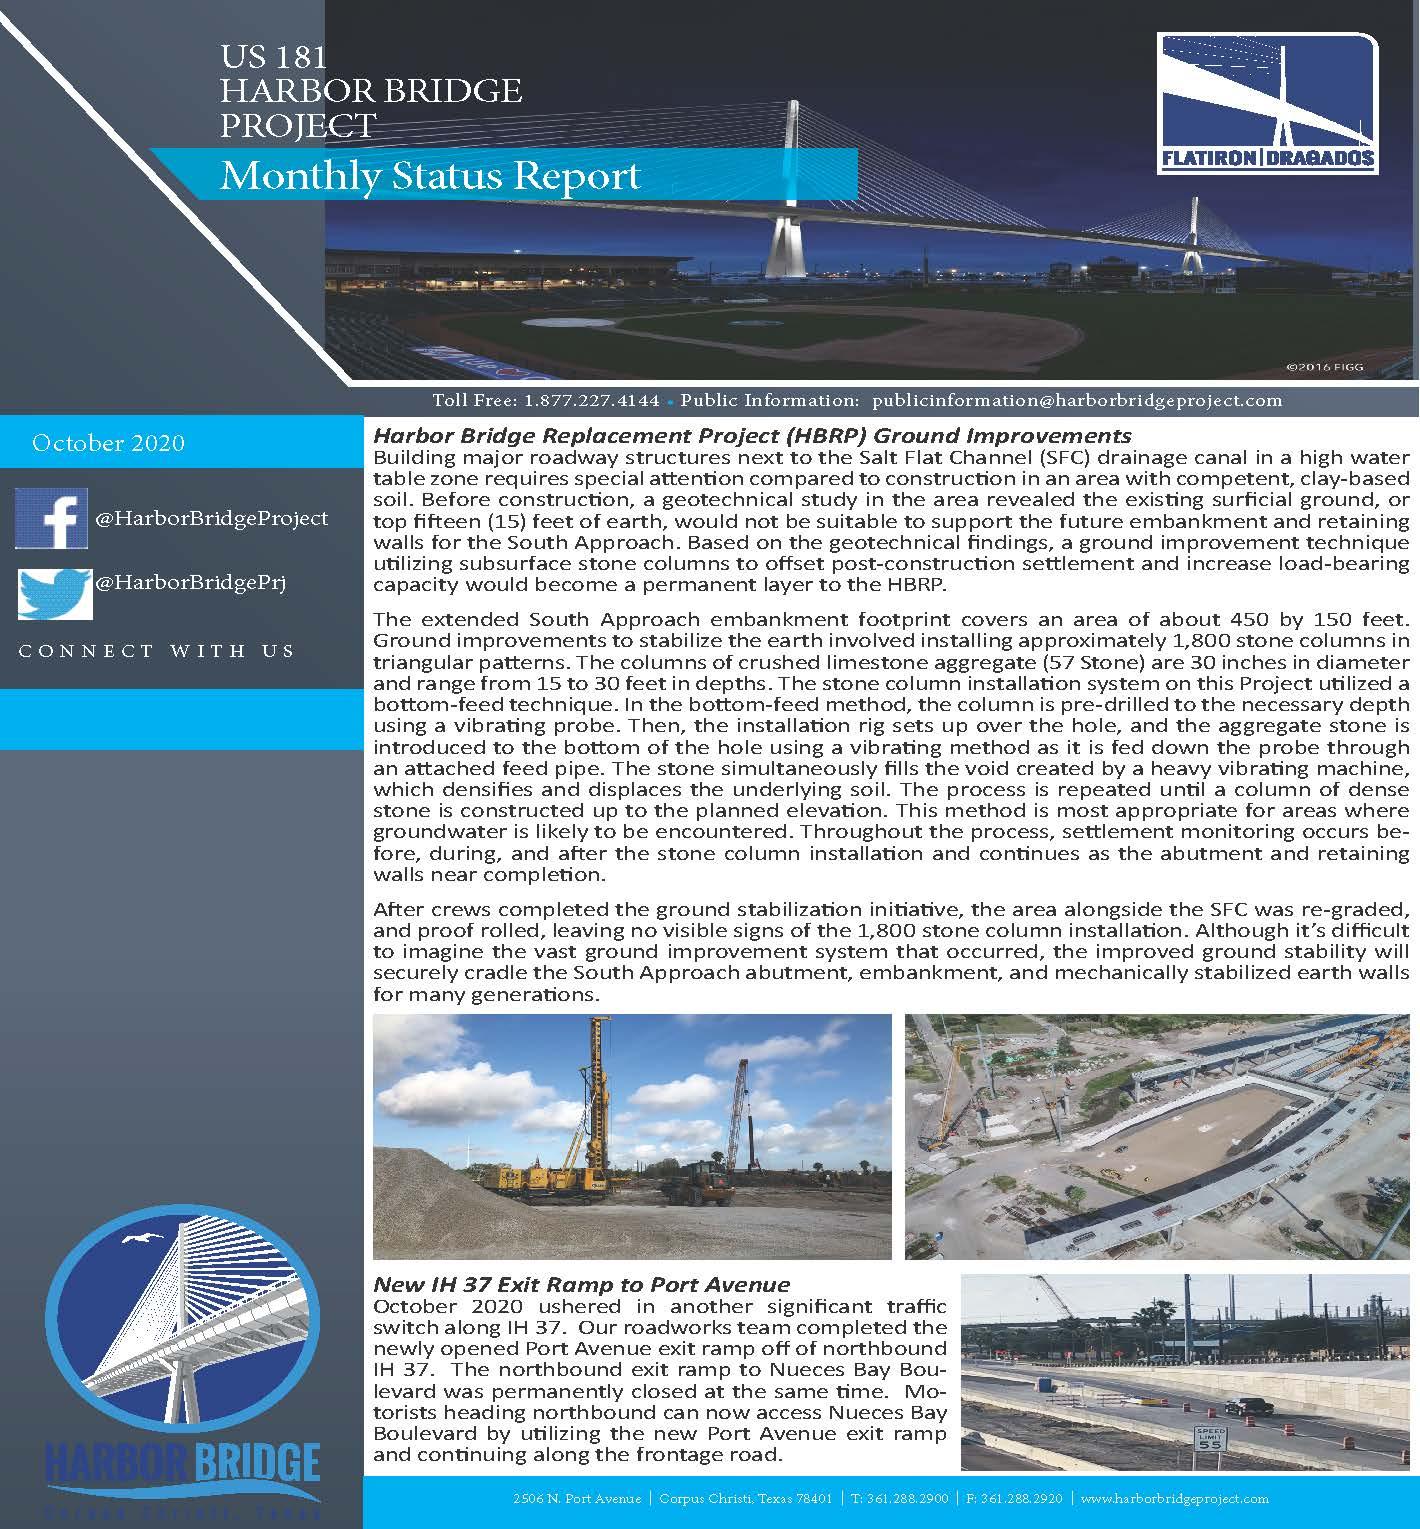 October 2020 Monthly Status Report